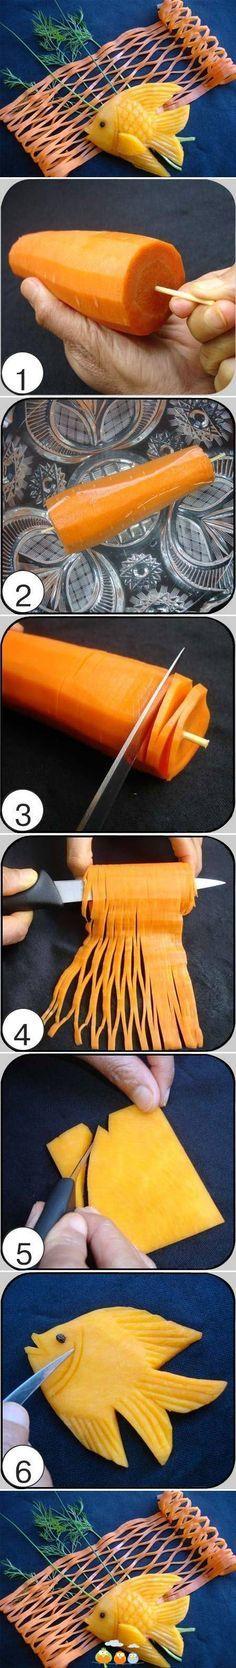 Filet de carotte